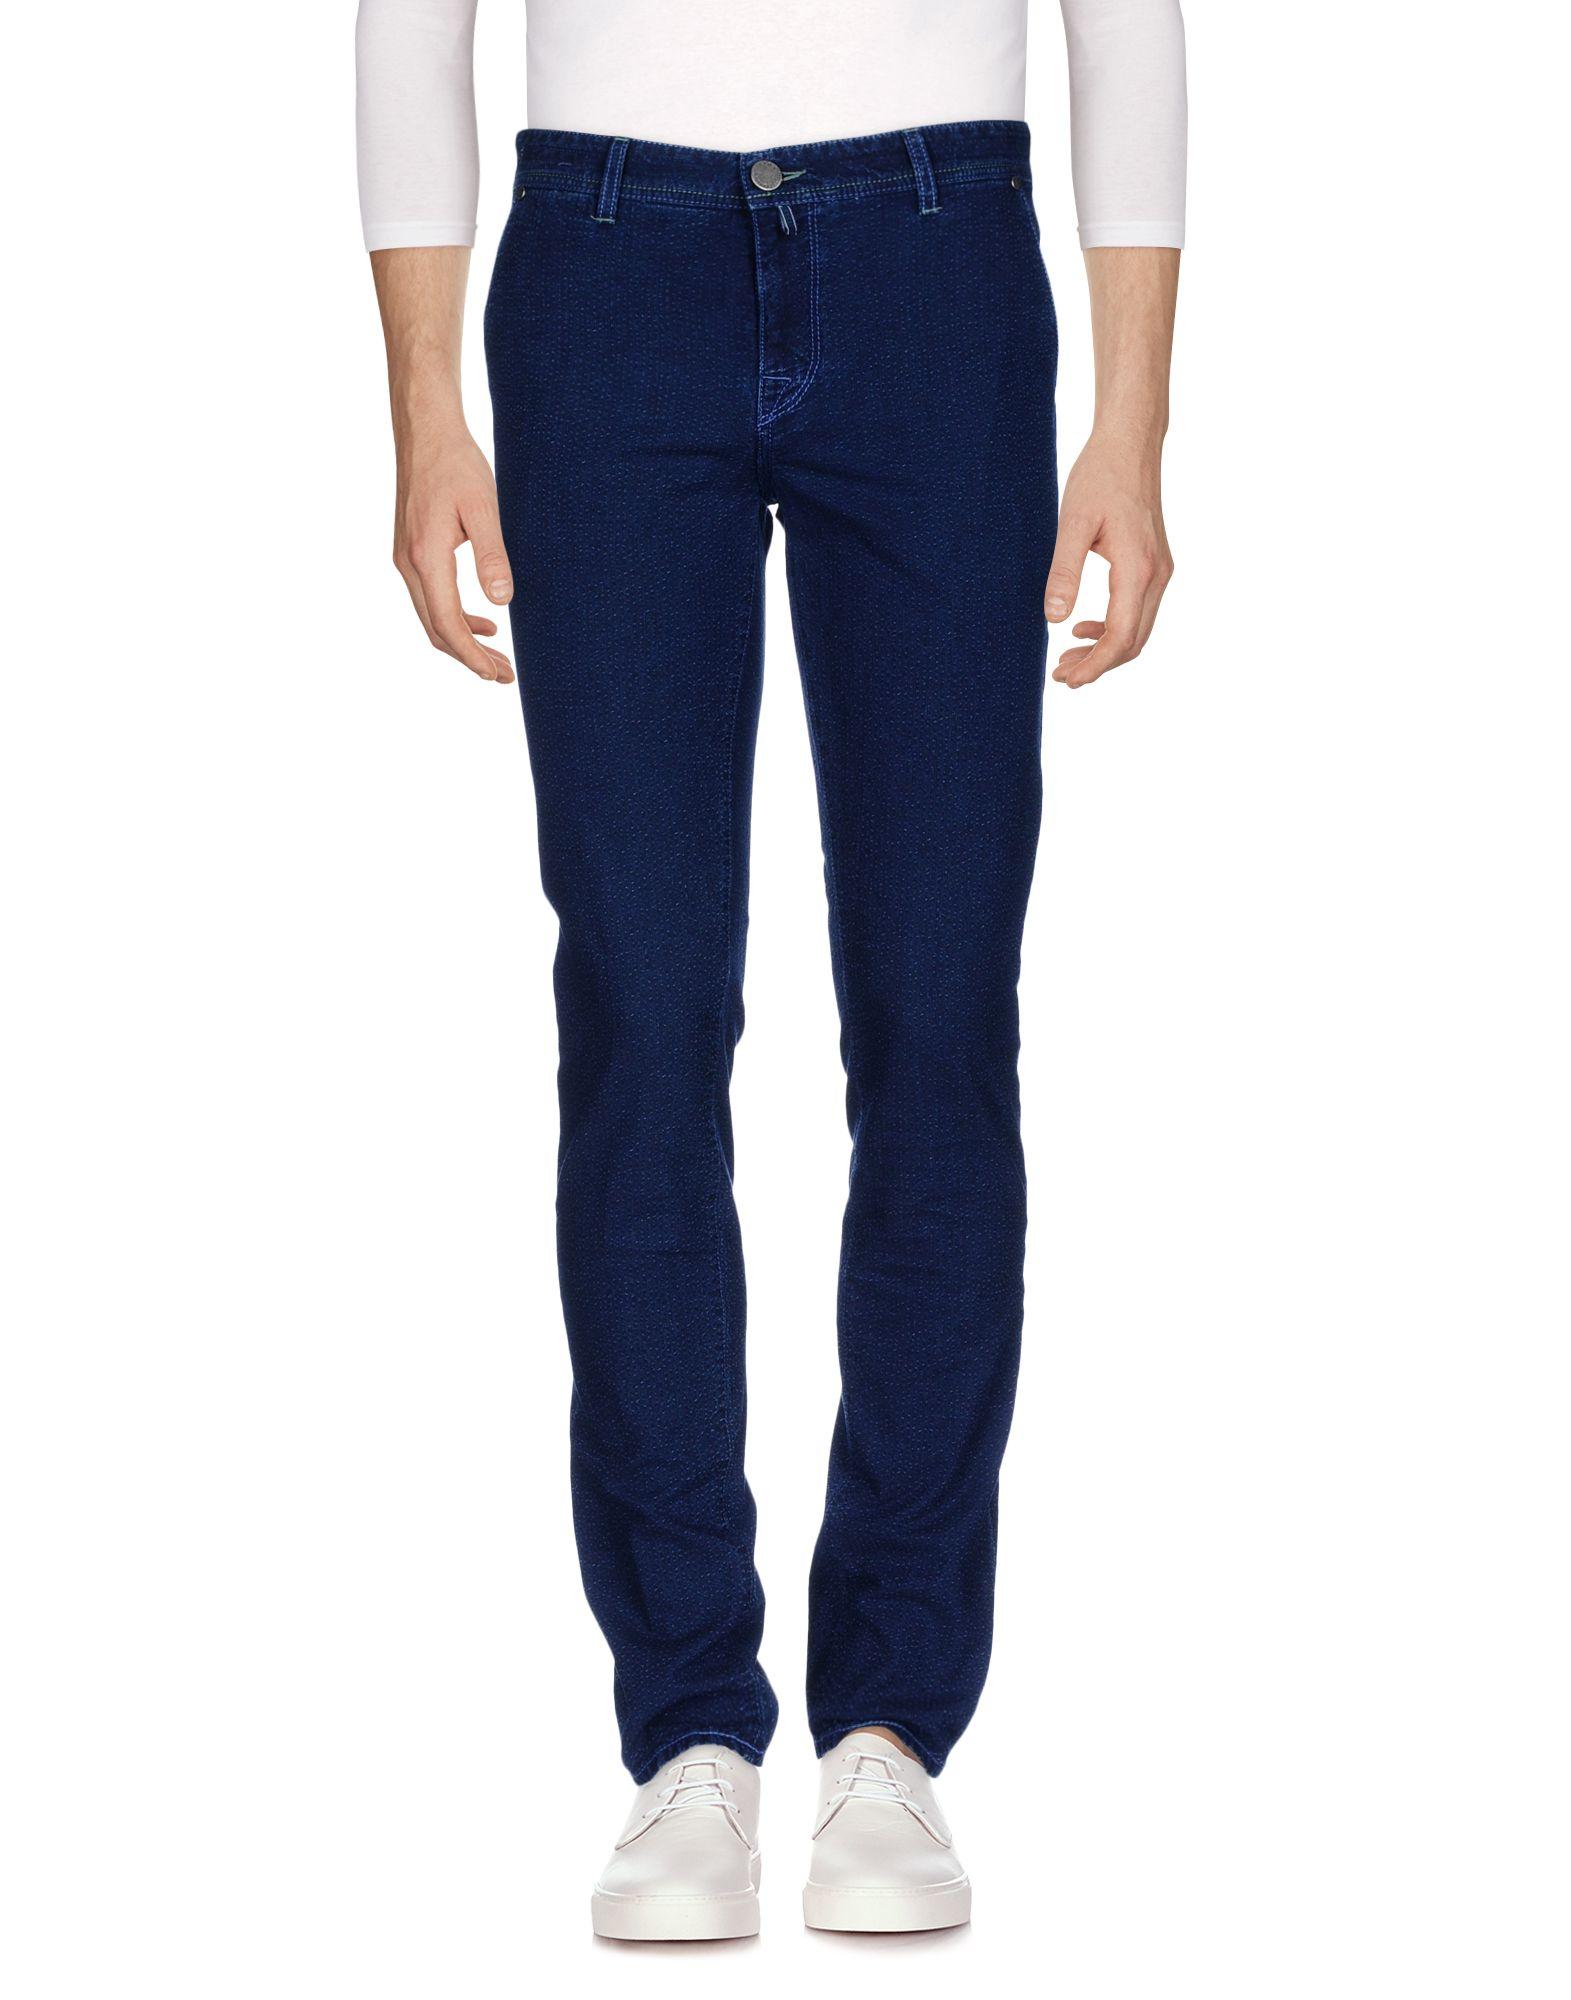 Pantaloni Jeans Luigi Borrelli Napoli Uomo - Acquista online su